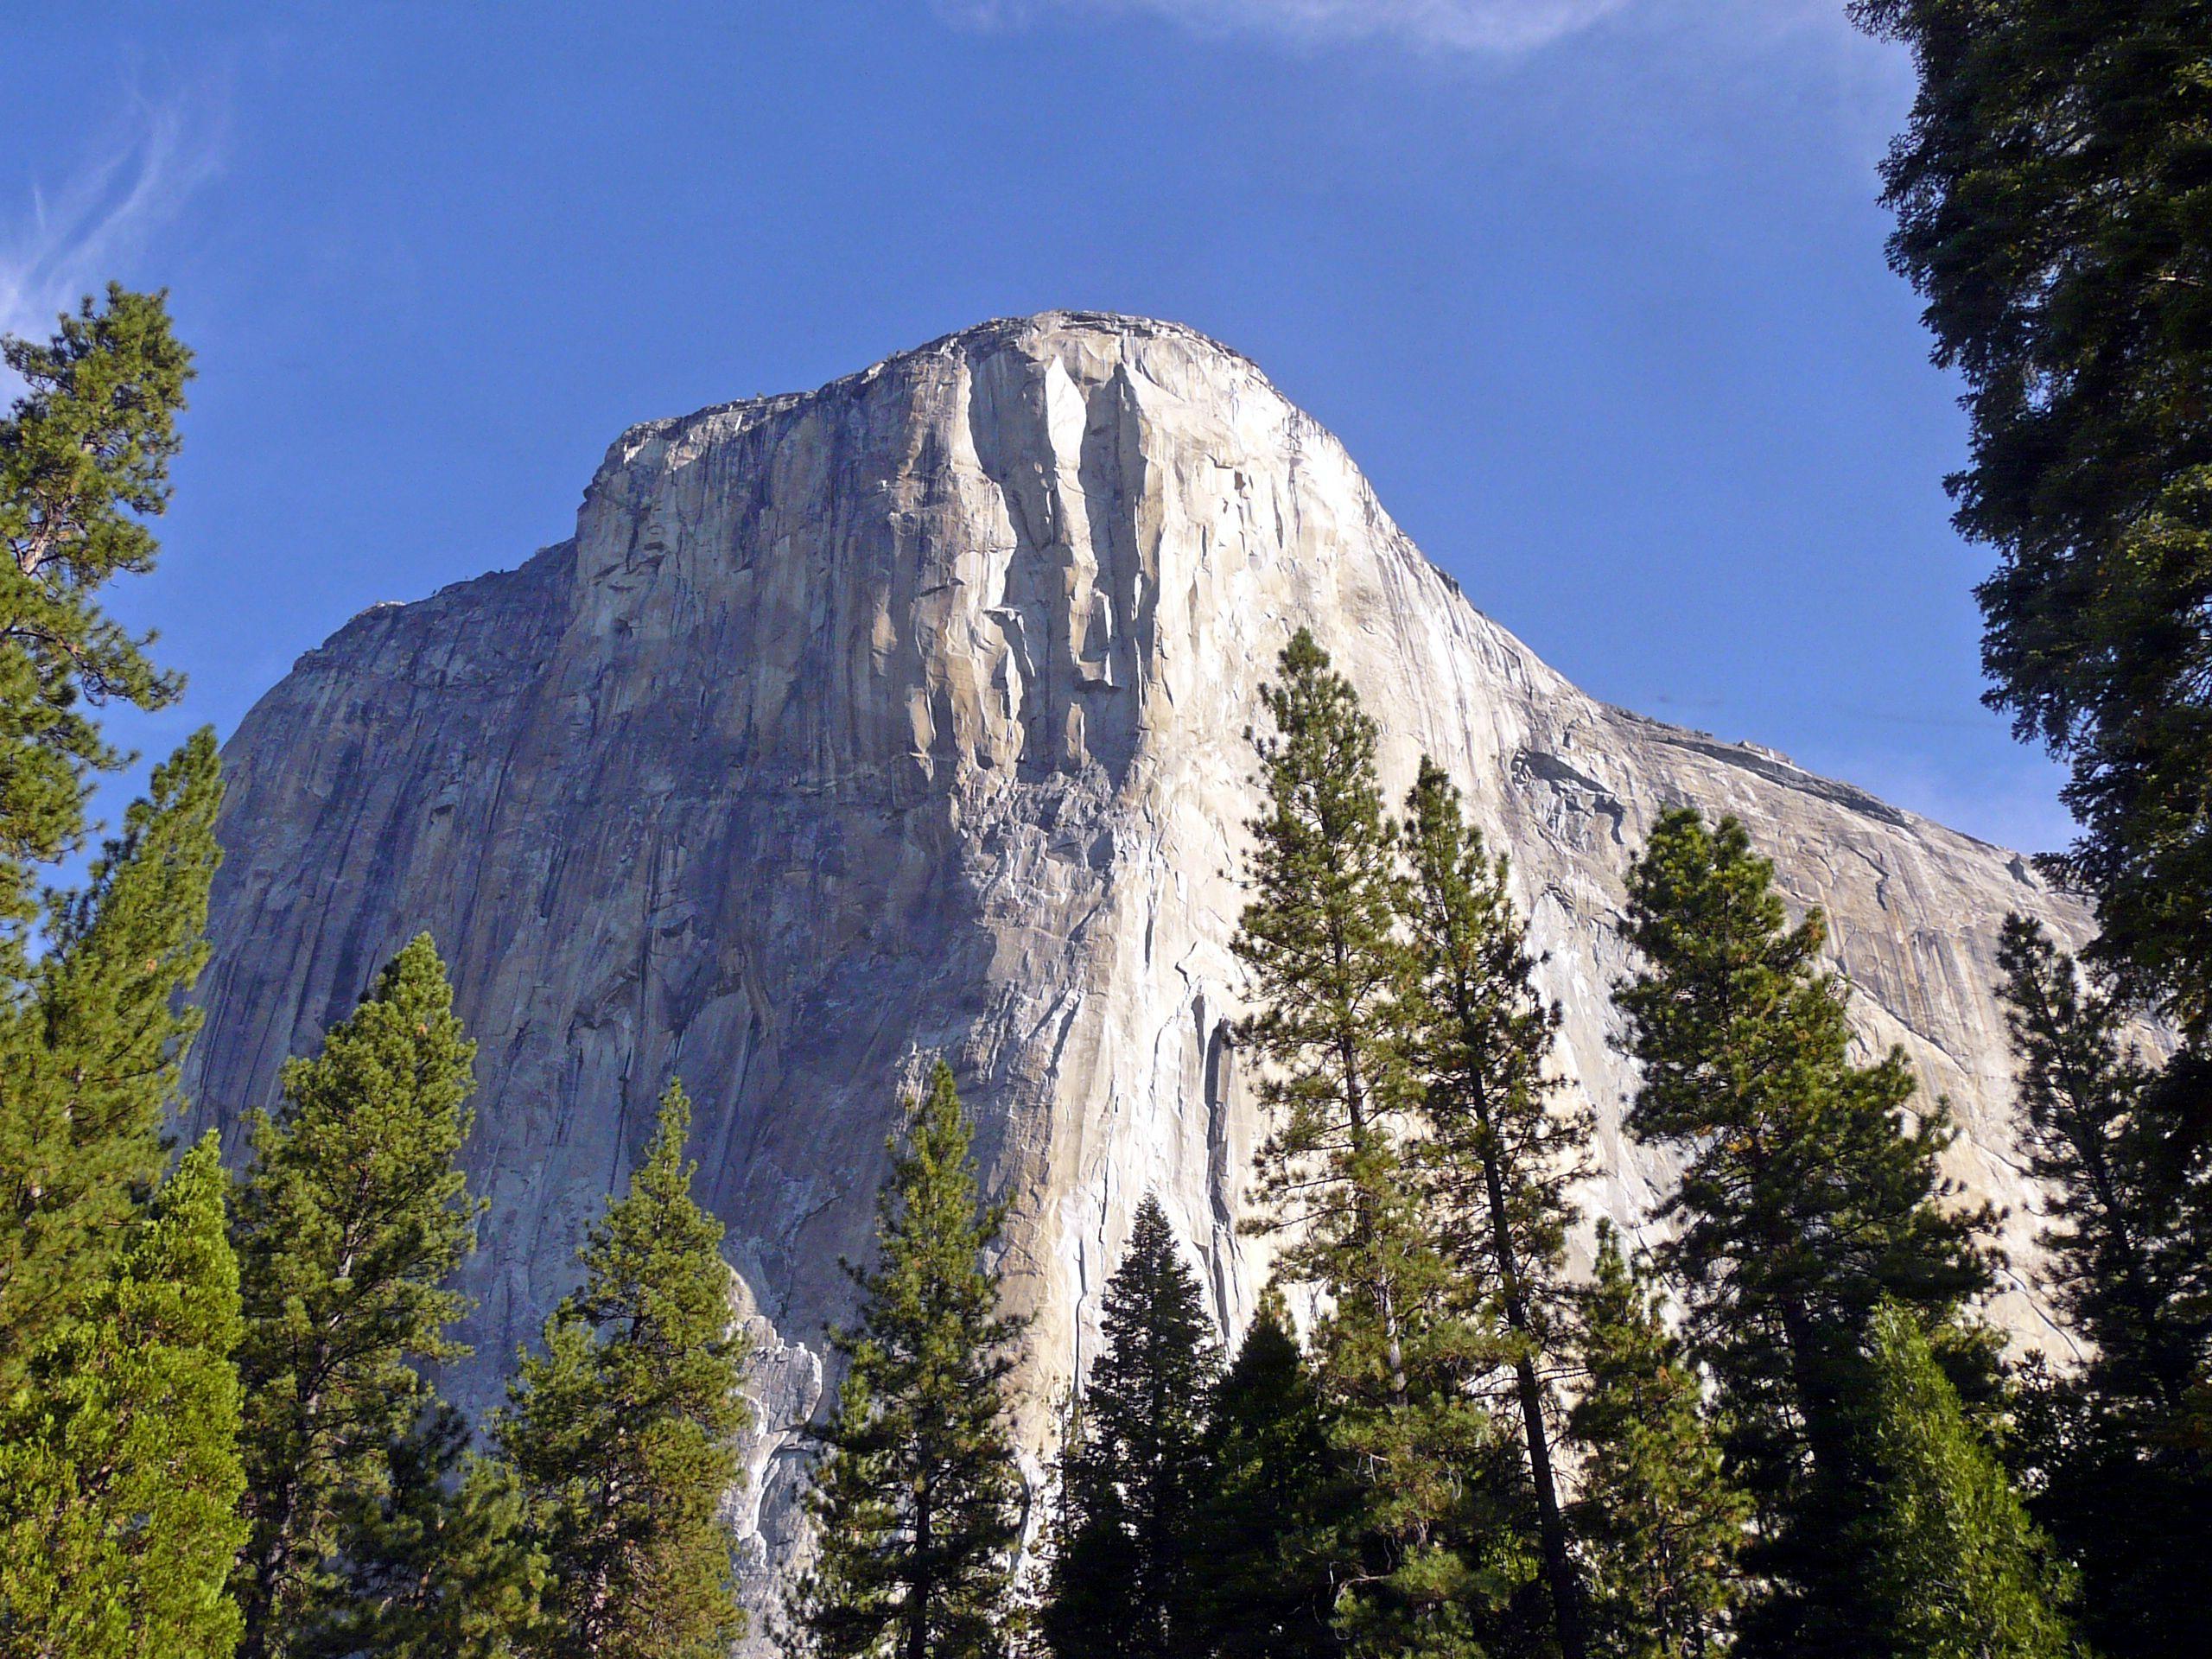 Pin by Mary McCrea on California_Yosemite | Yosemite